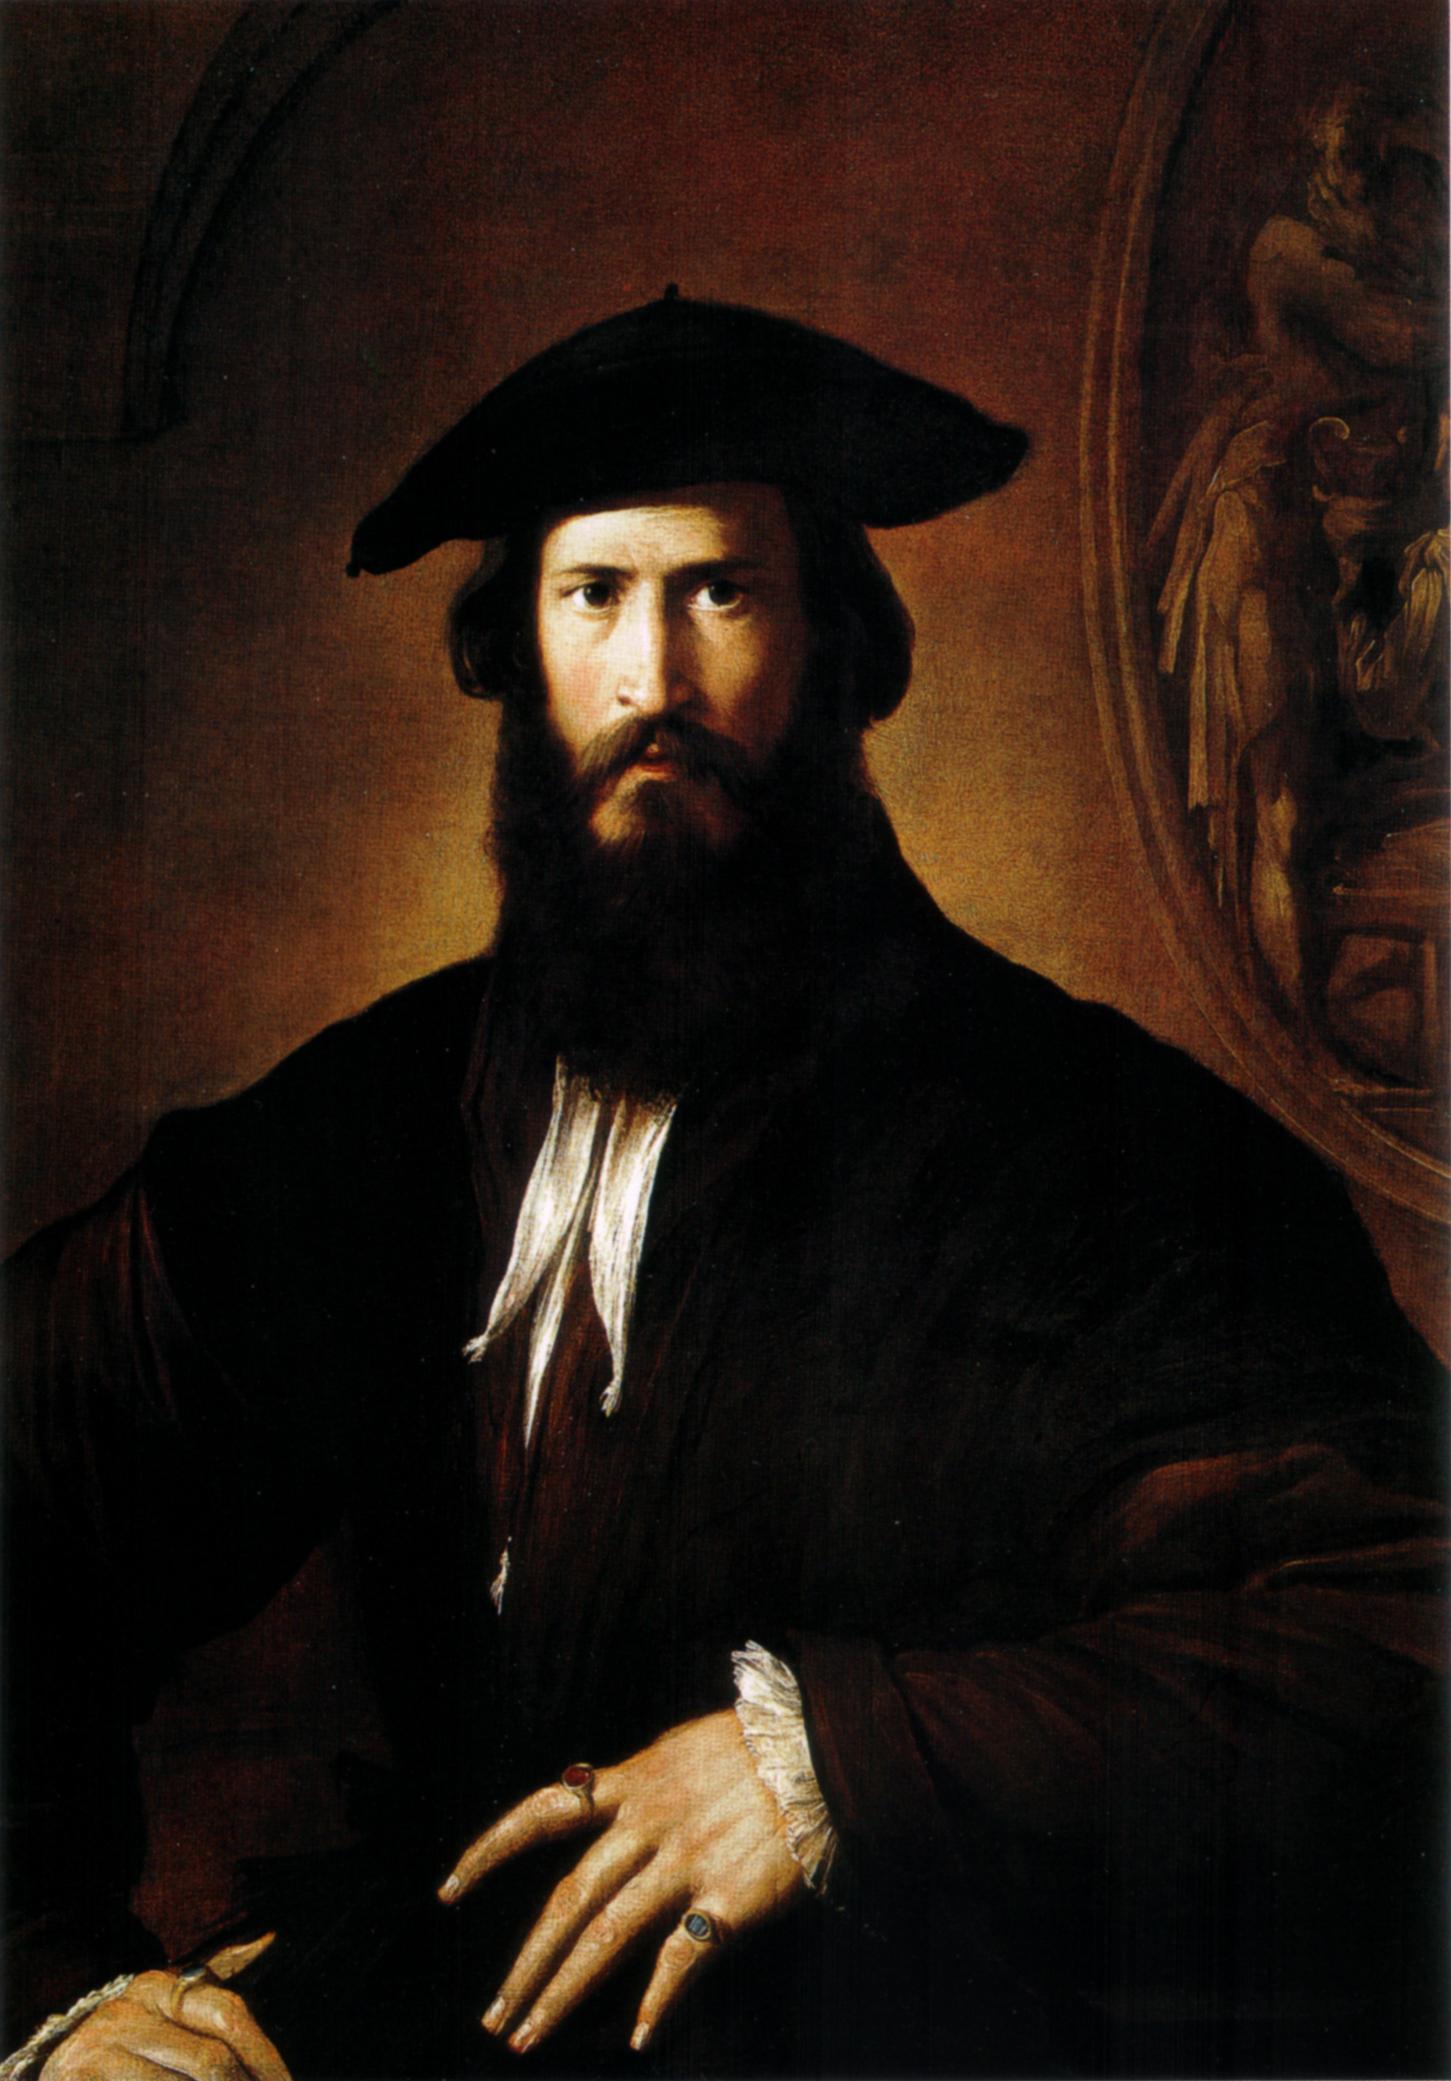 File:Parmigianino, ritratto maschile uffizi.jpg - Wikipedia